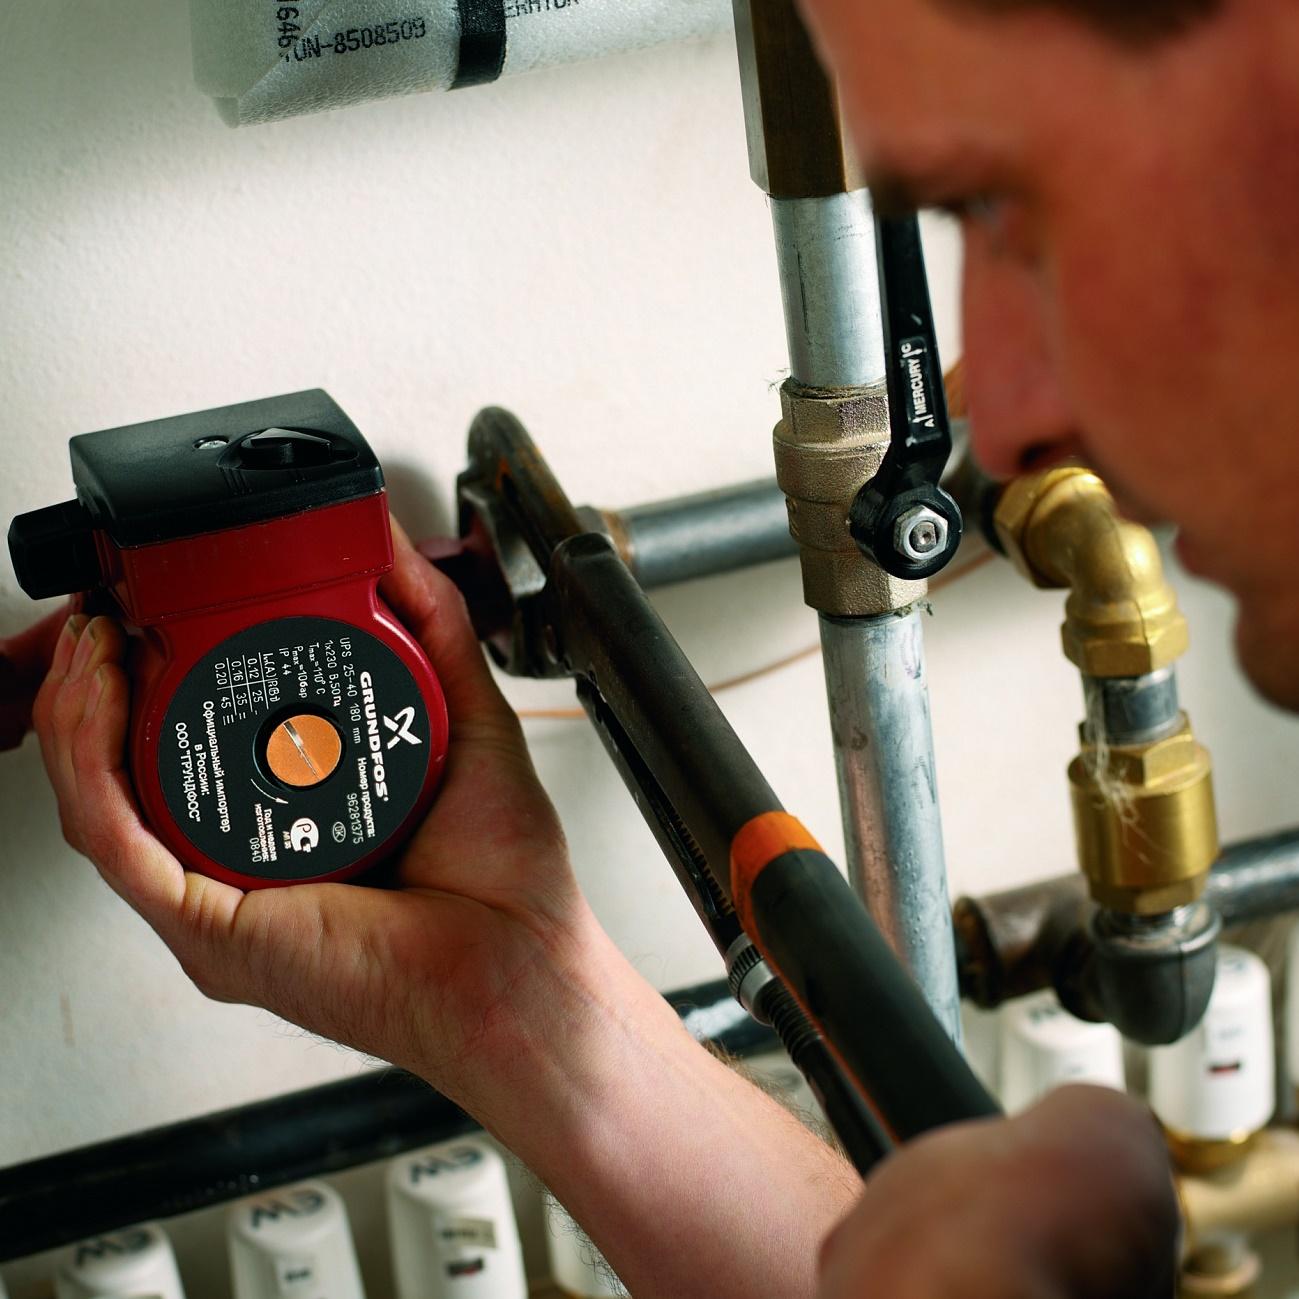 Water floor heating pump